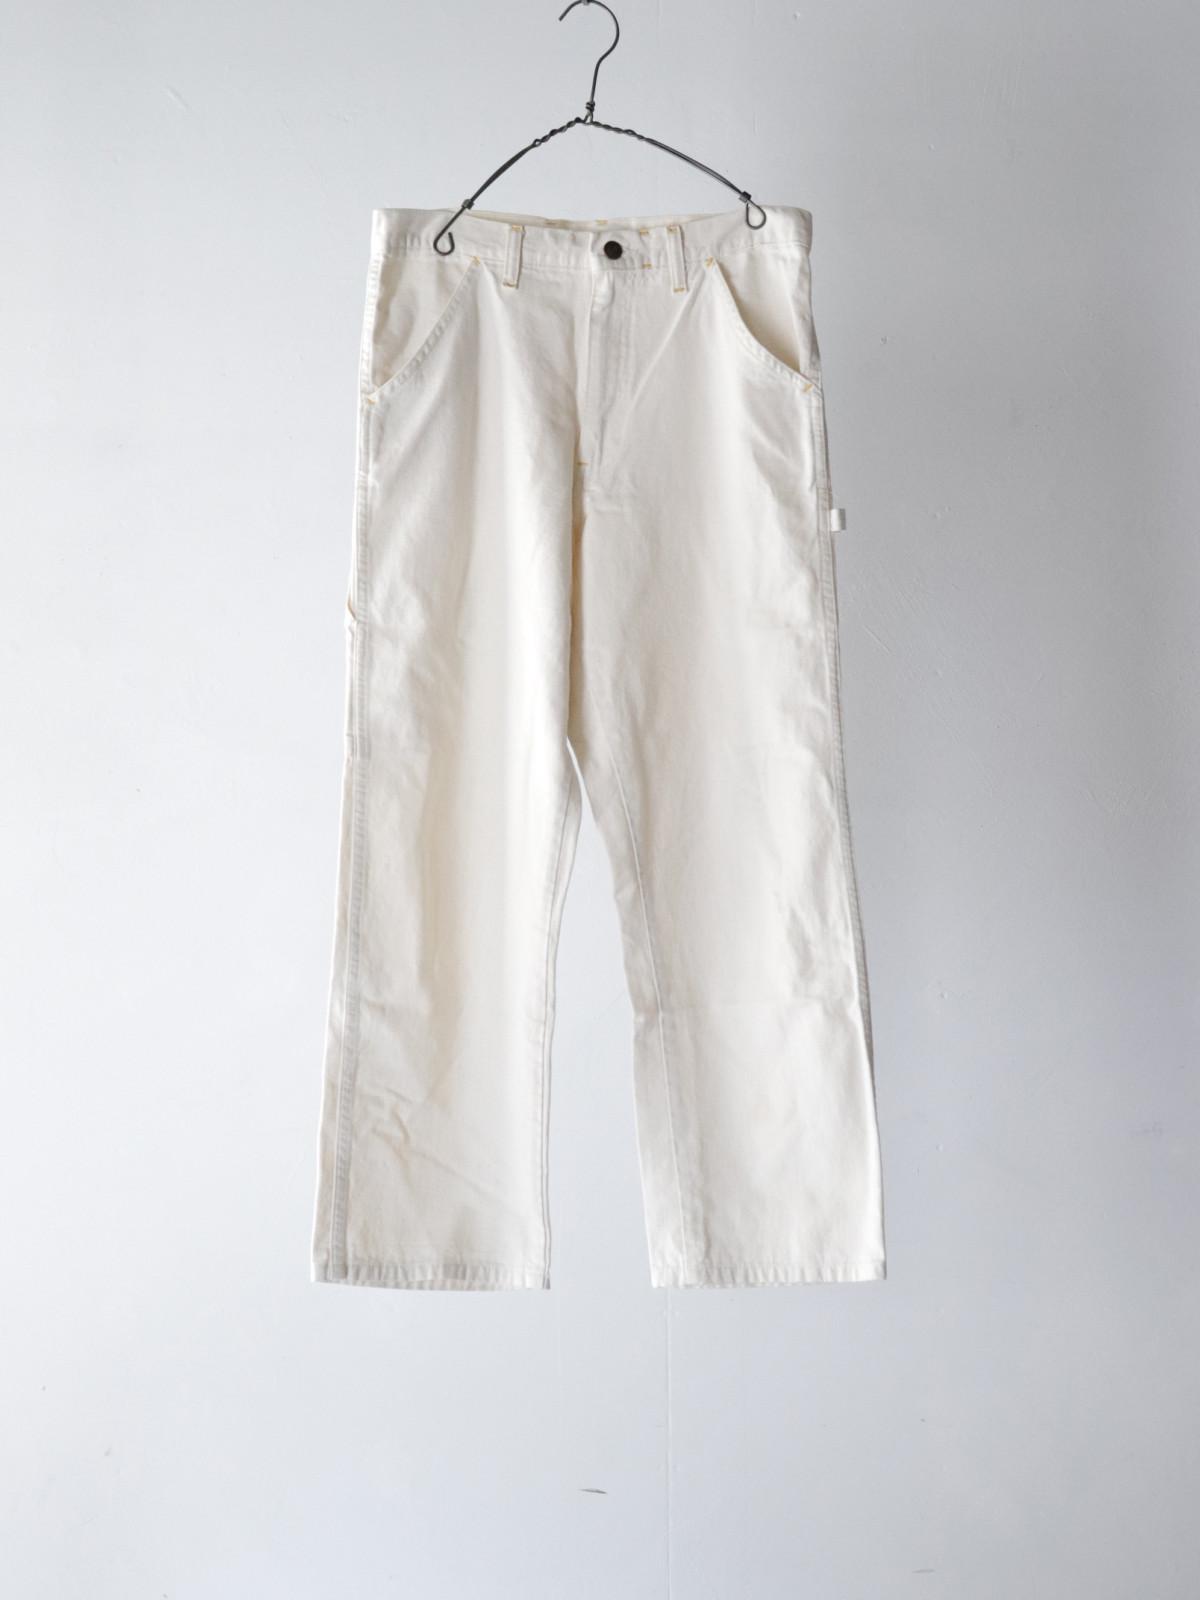 USA,painter pants,vintage